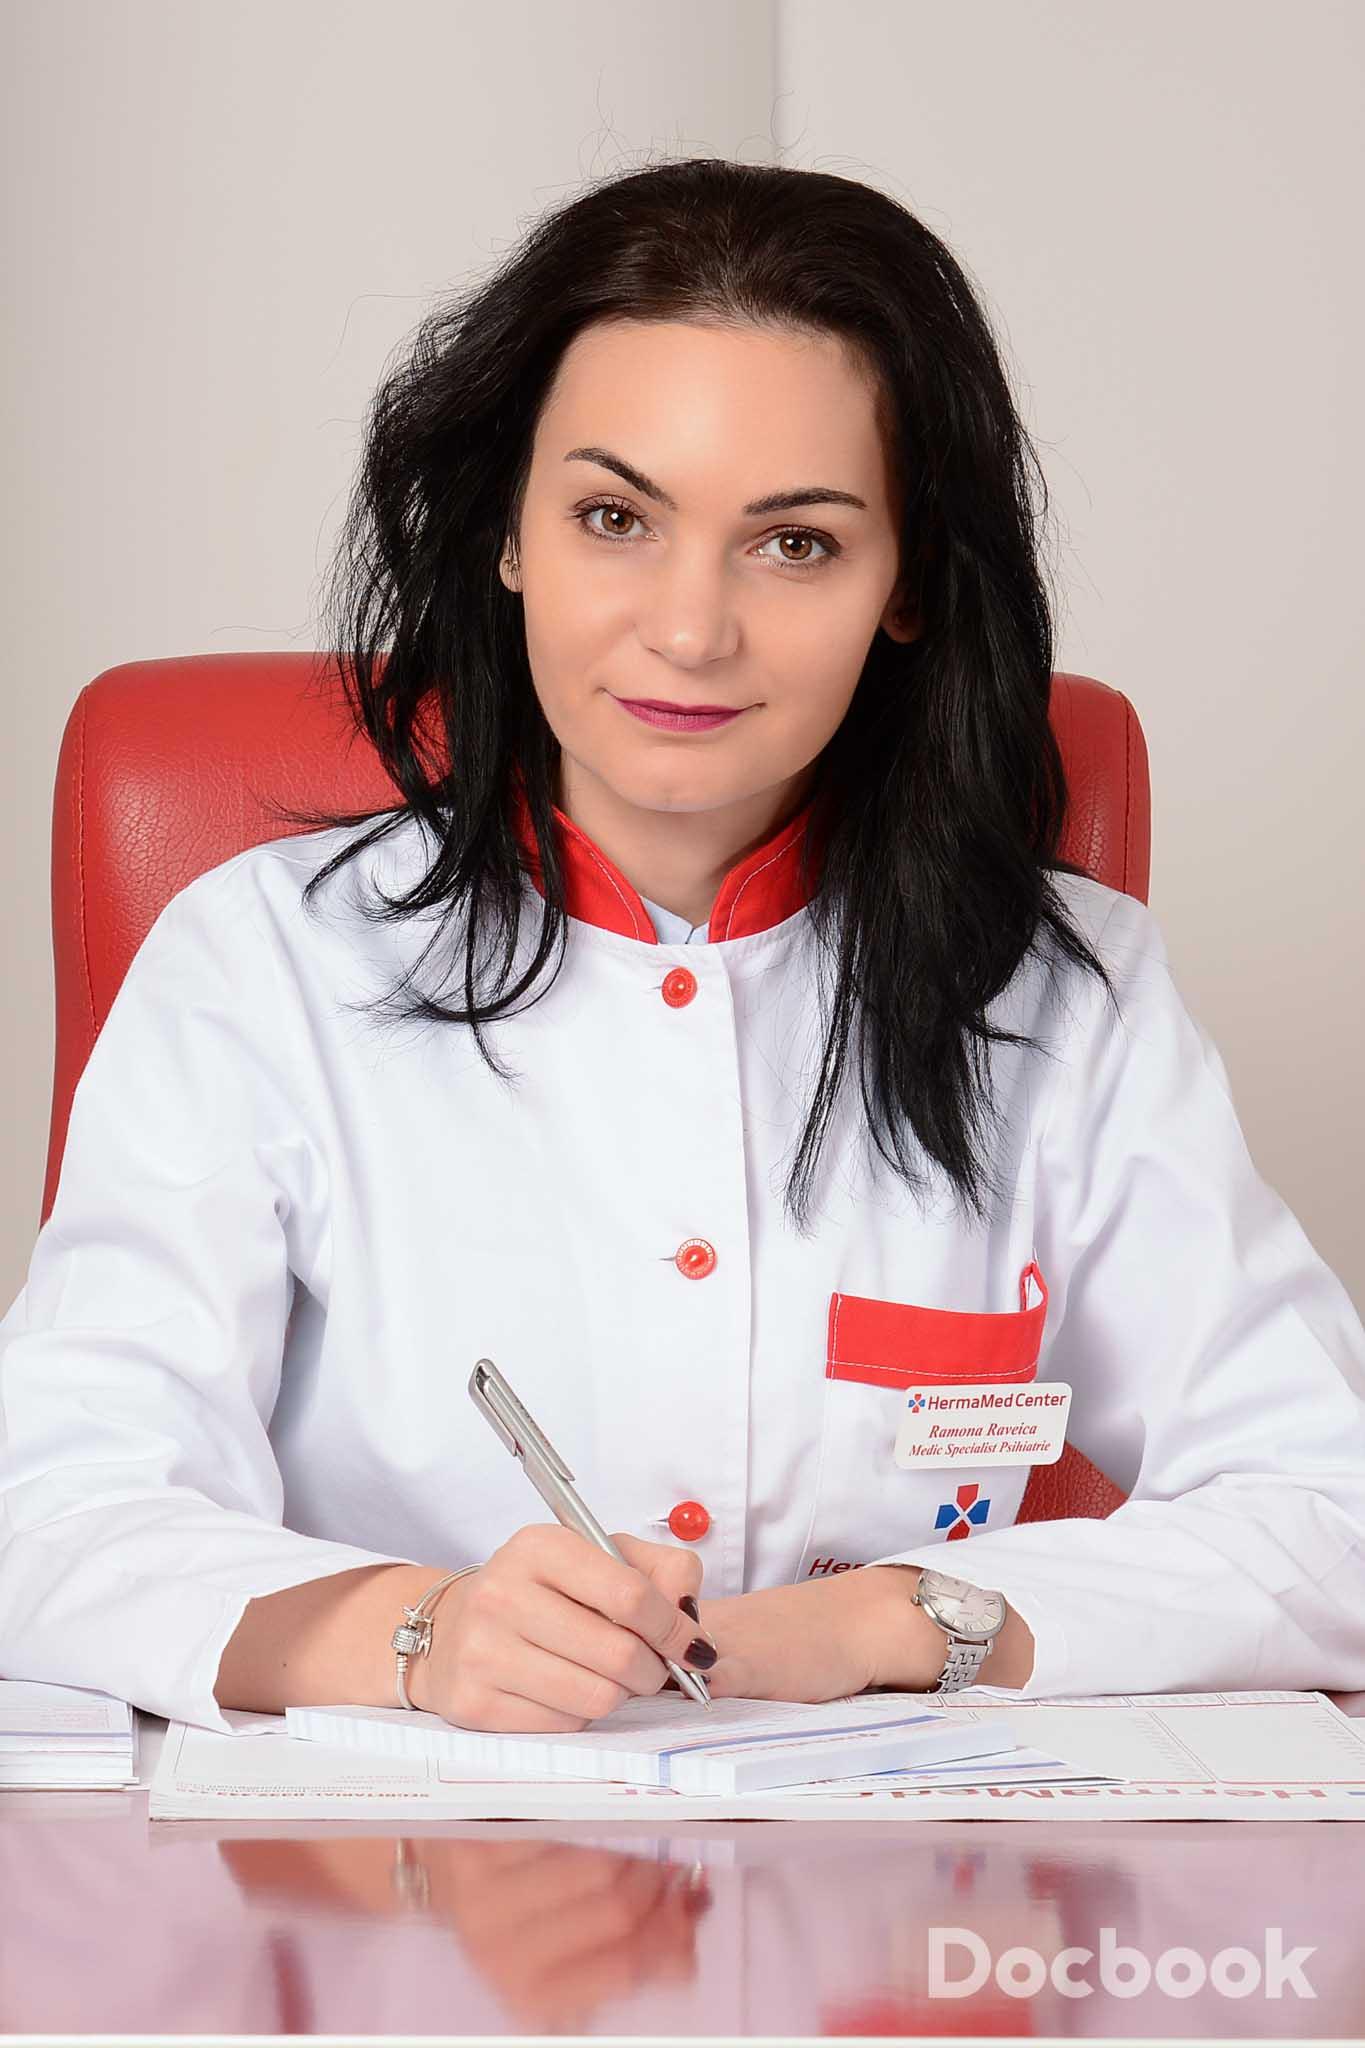 Dr. Ramona Raveica